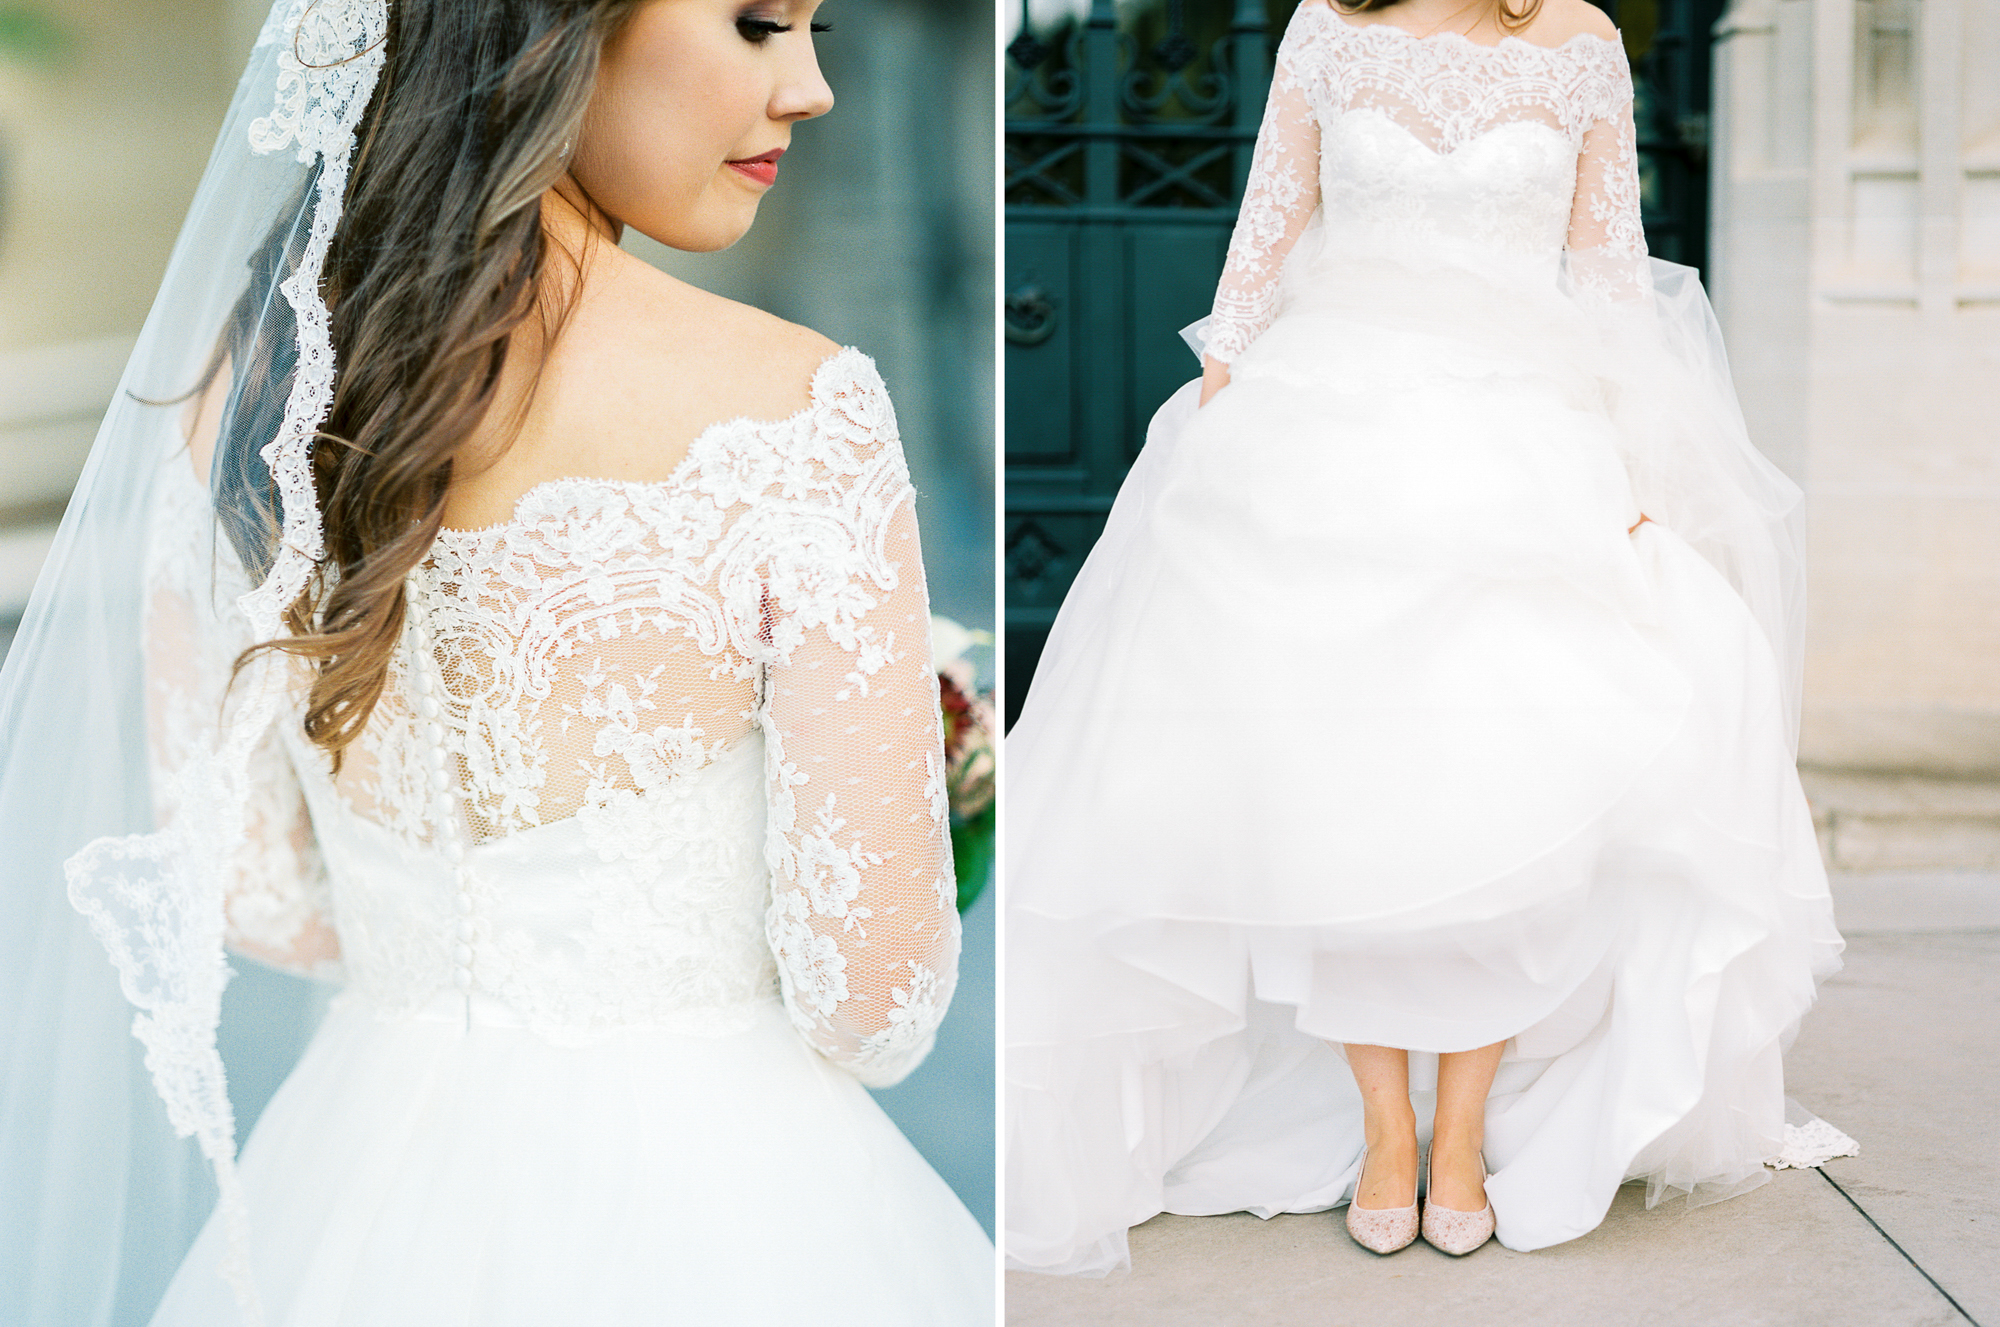 timeless-classy-cathedral-veil-bridal-session-biltmore-north-carolina-wedding-film-photographer-10.jpg